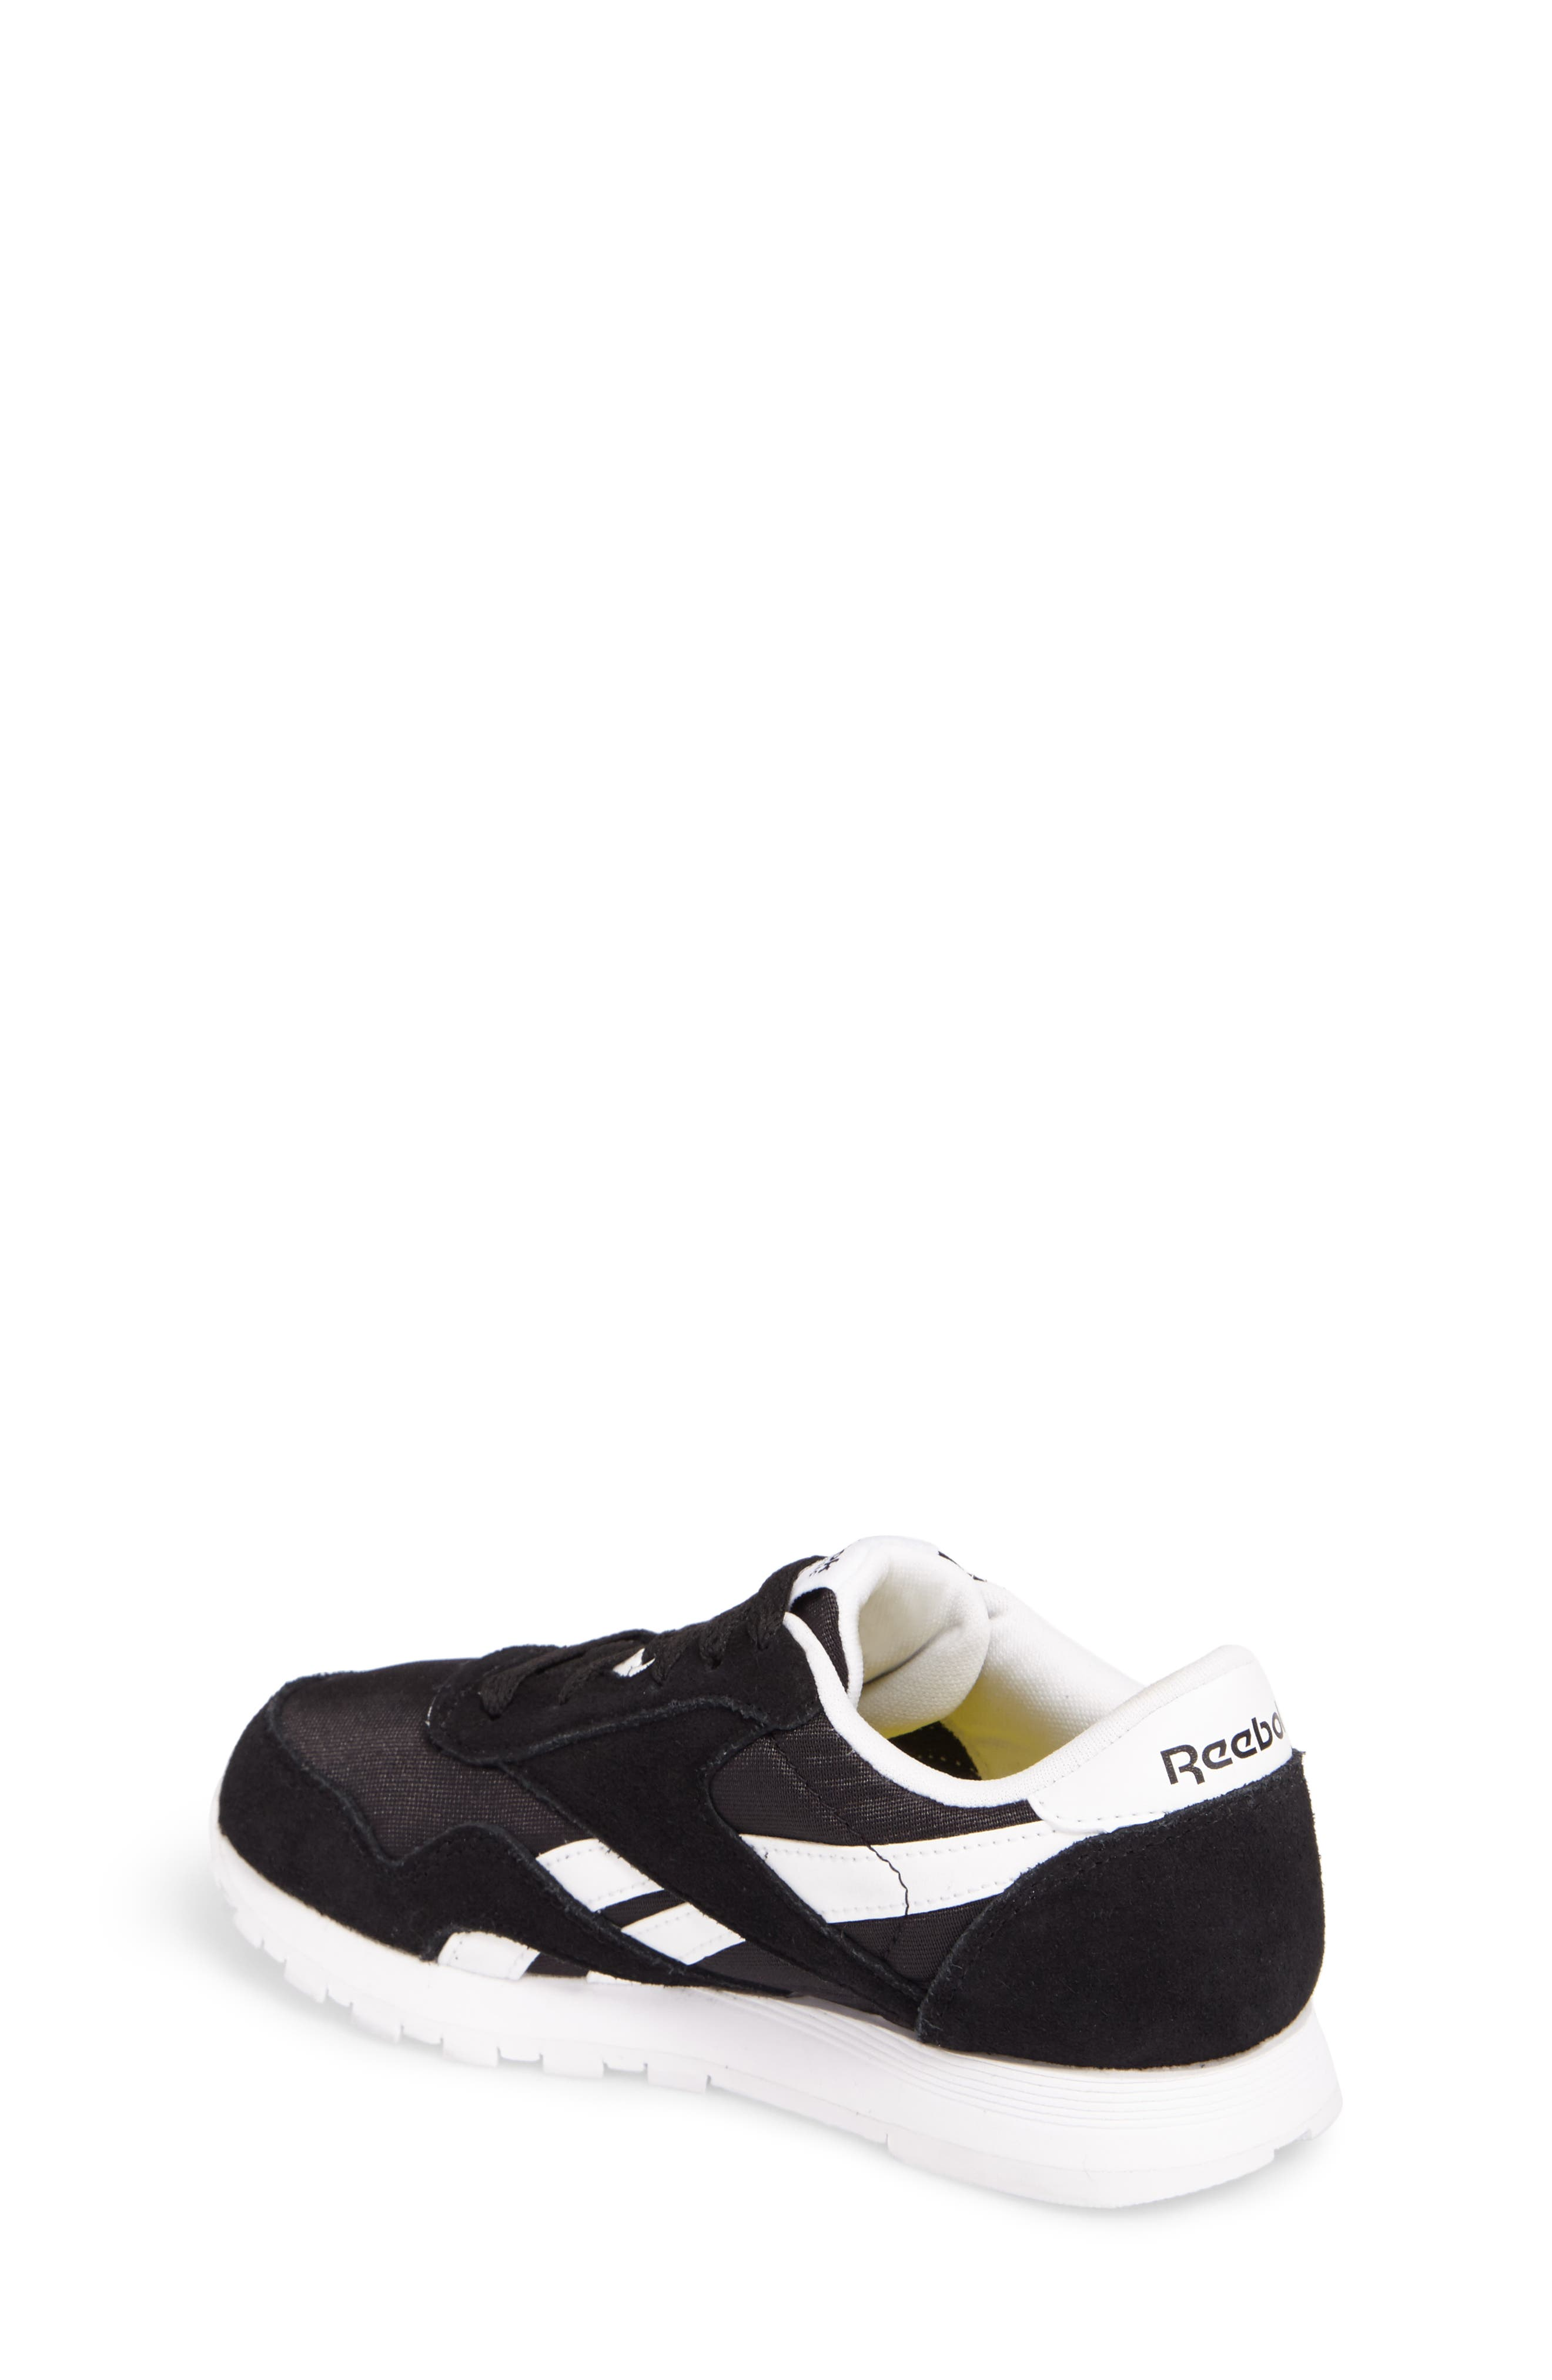 Classic Nylon Sneaker,                             Alternate thumbnail 2, color,                             Black/ White